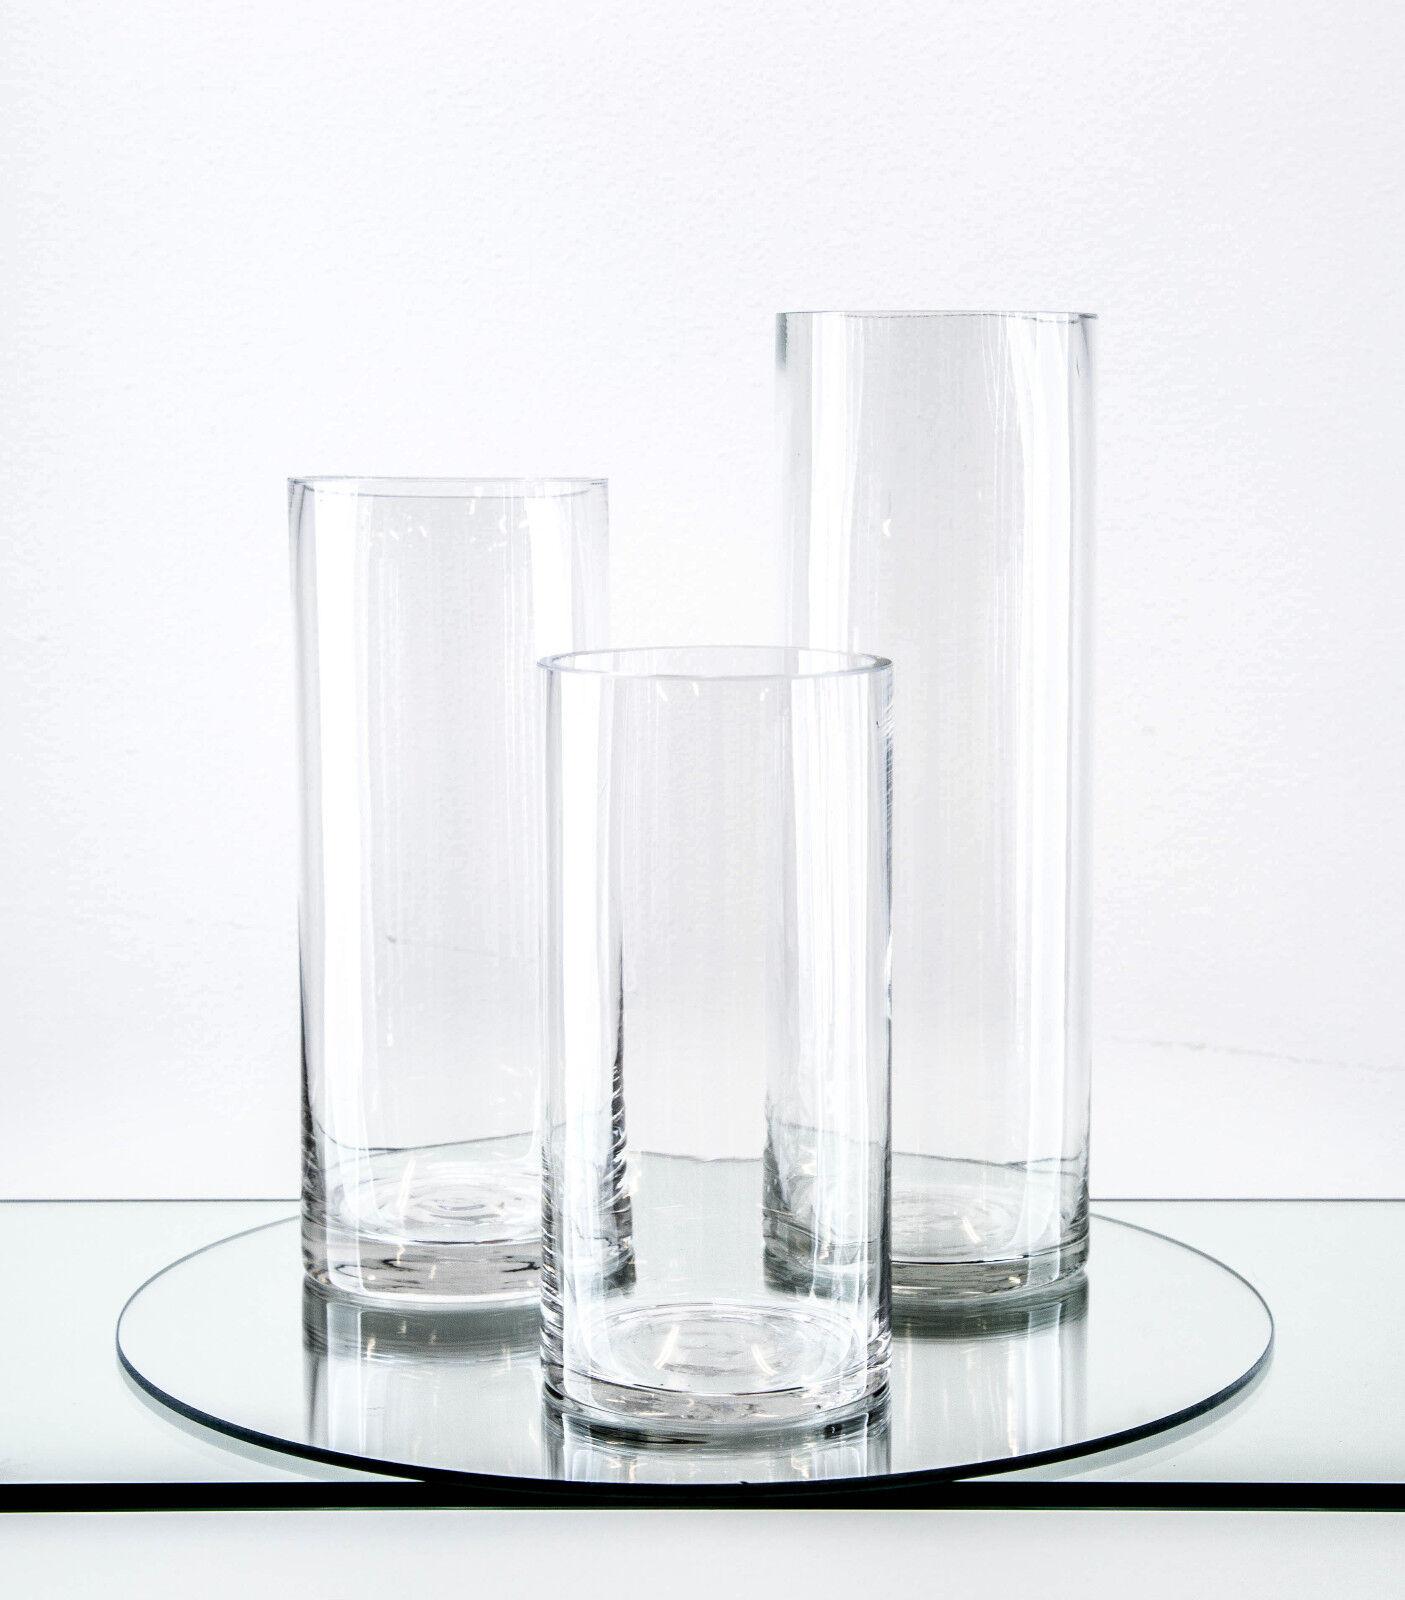 2 inspirational floating vase home idea cylinder floating candle vase set of 36 pcs 10 12 floridaeventfo Gallery